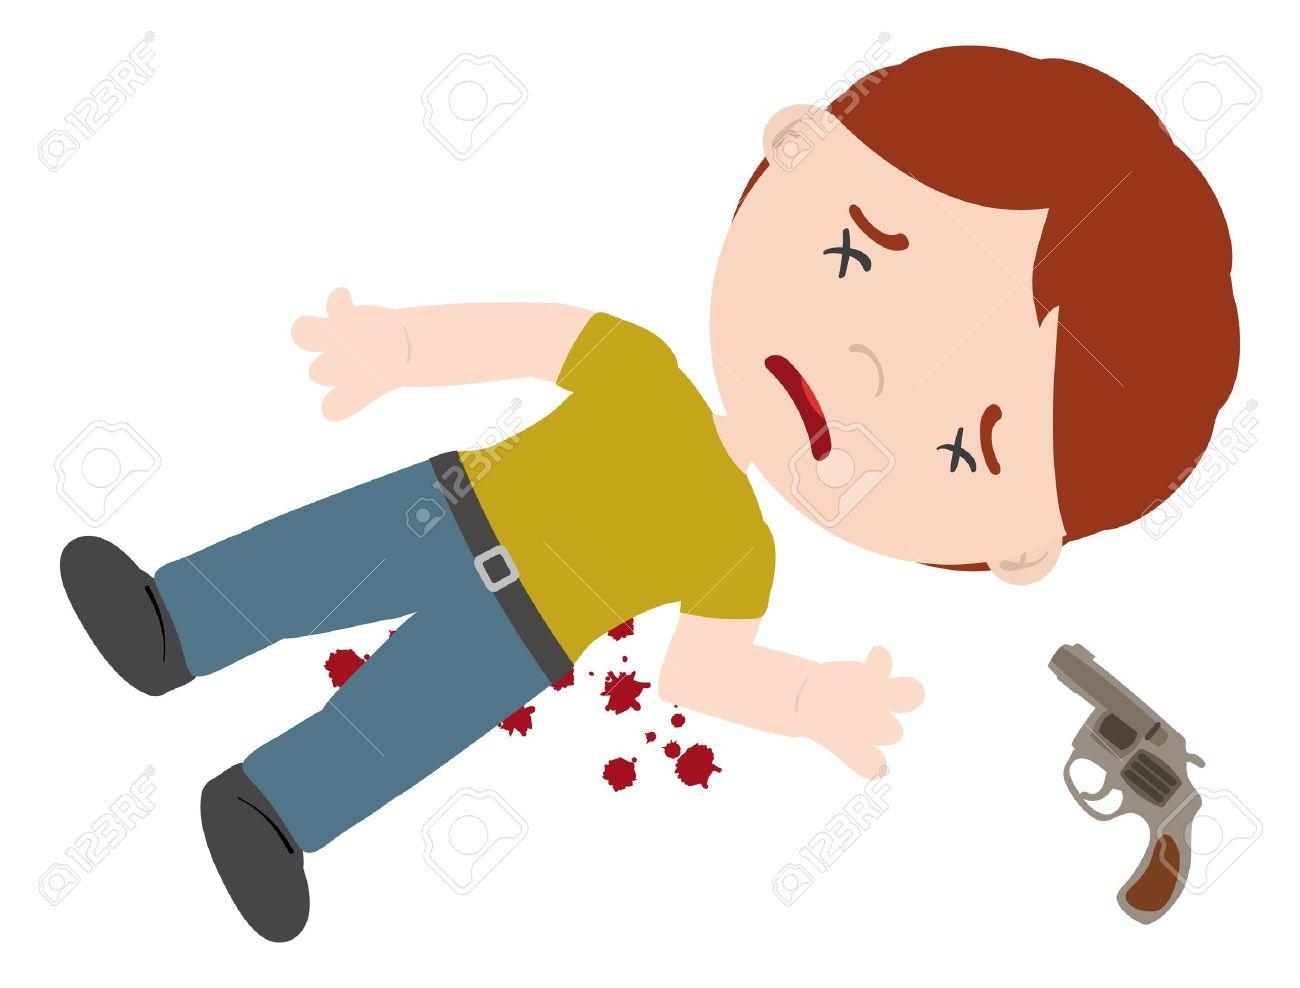 homicide of men, crime scene - 15197669